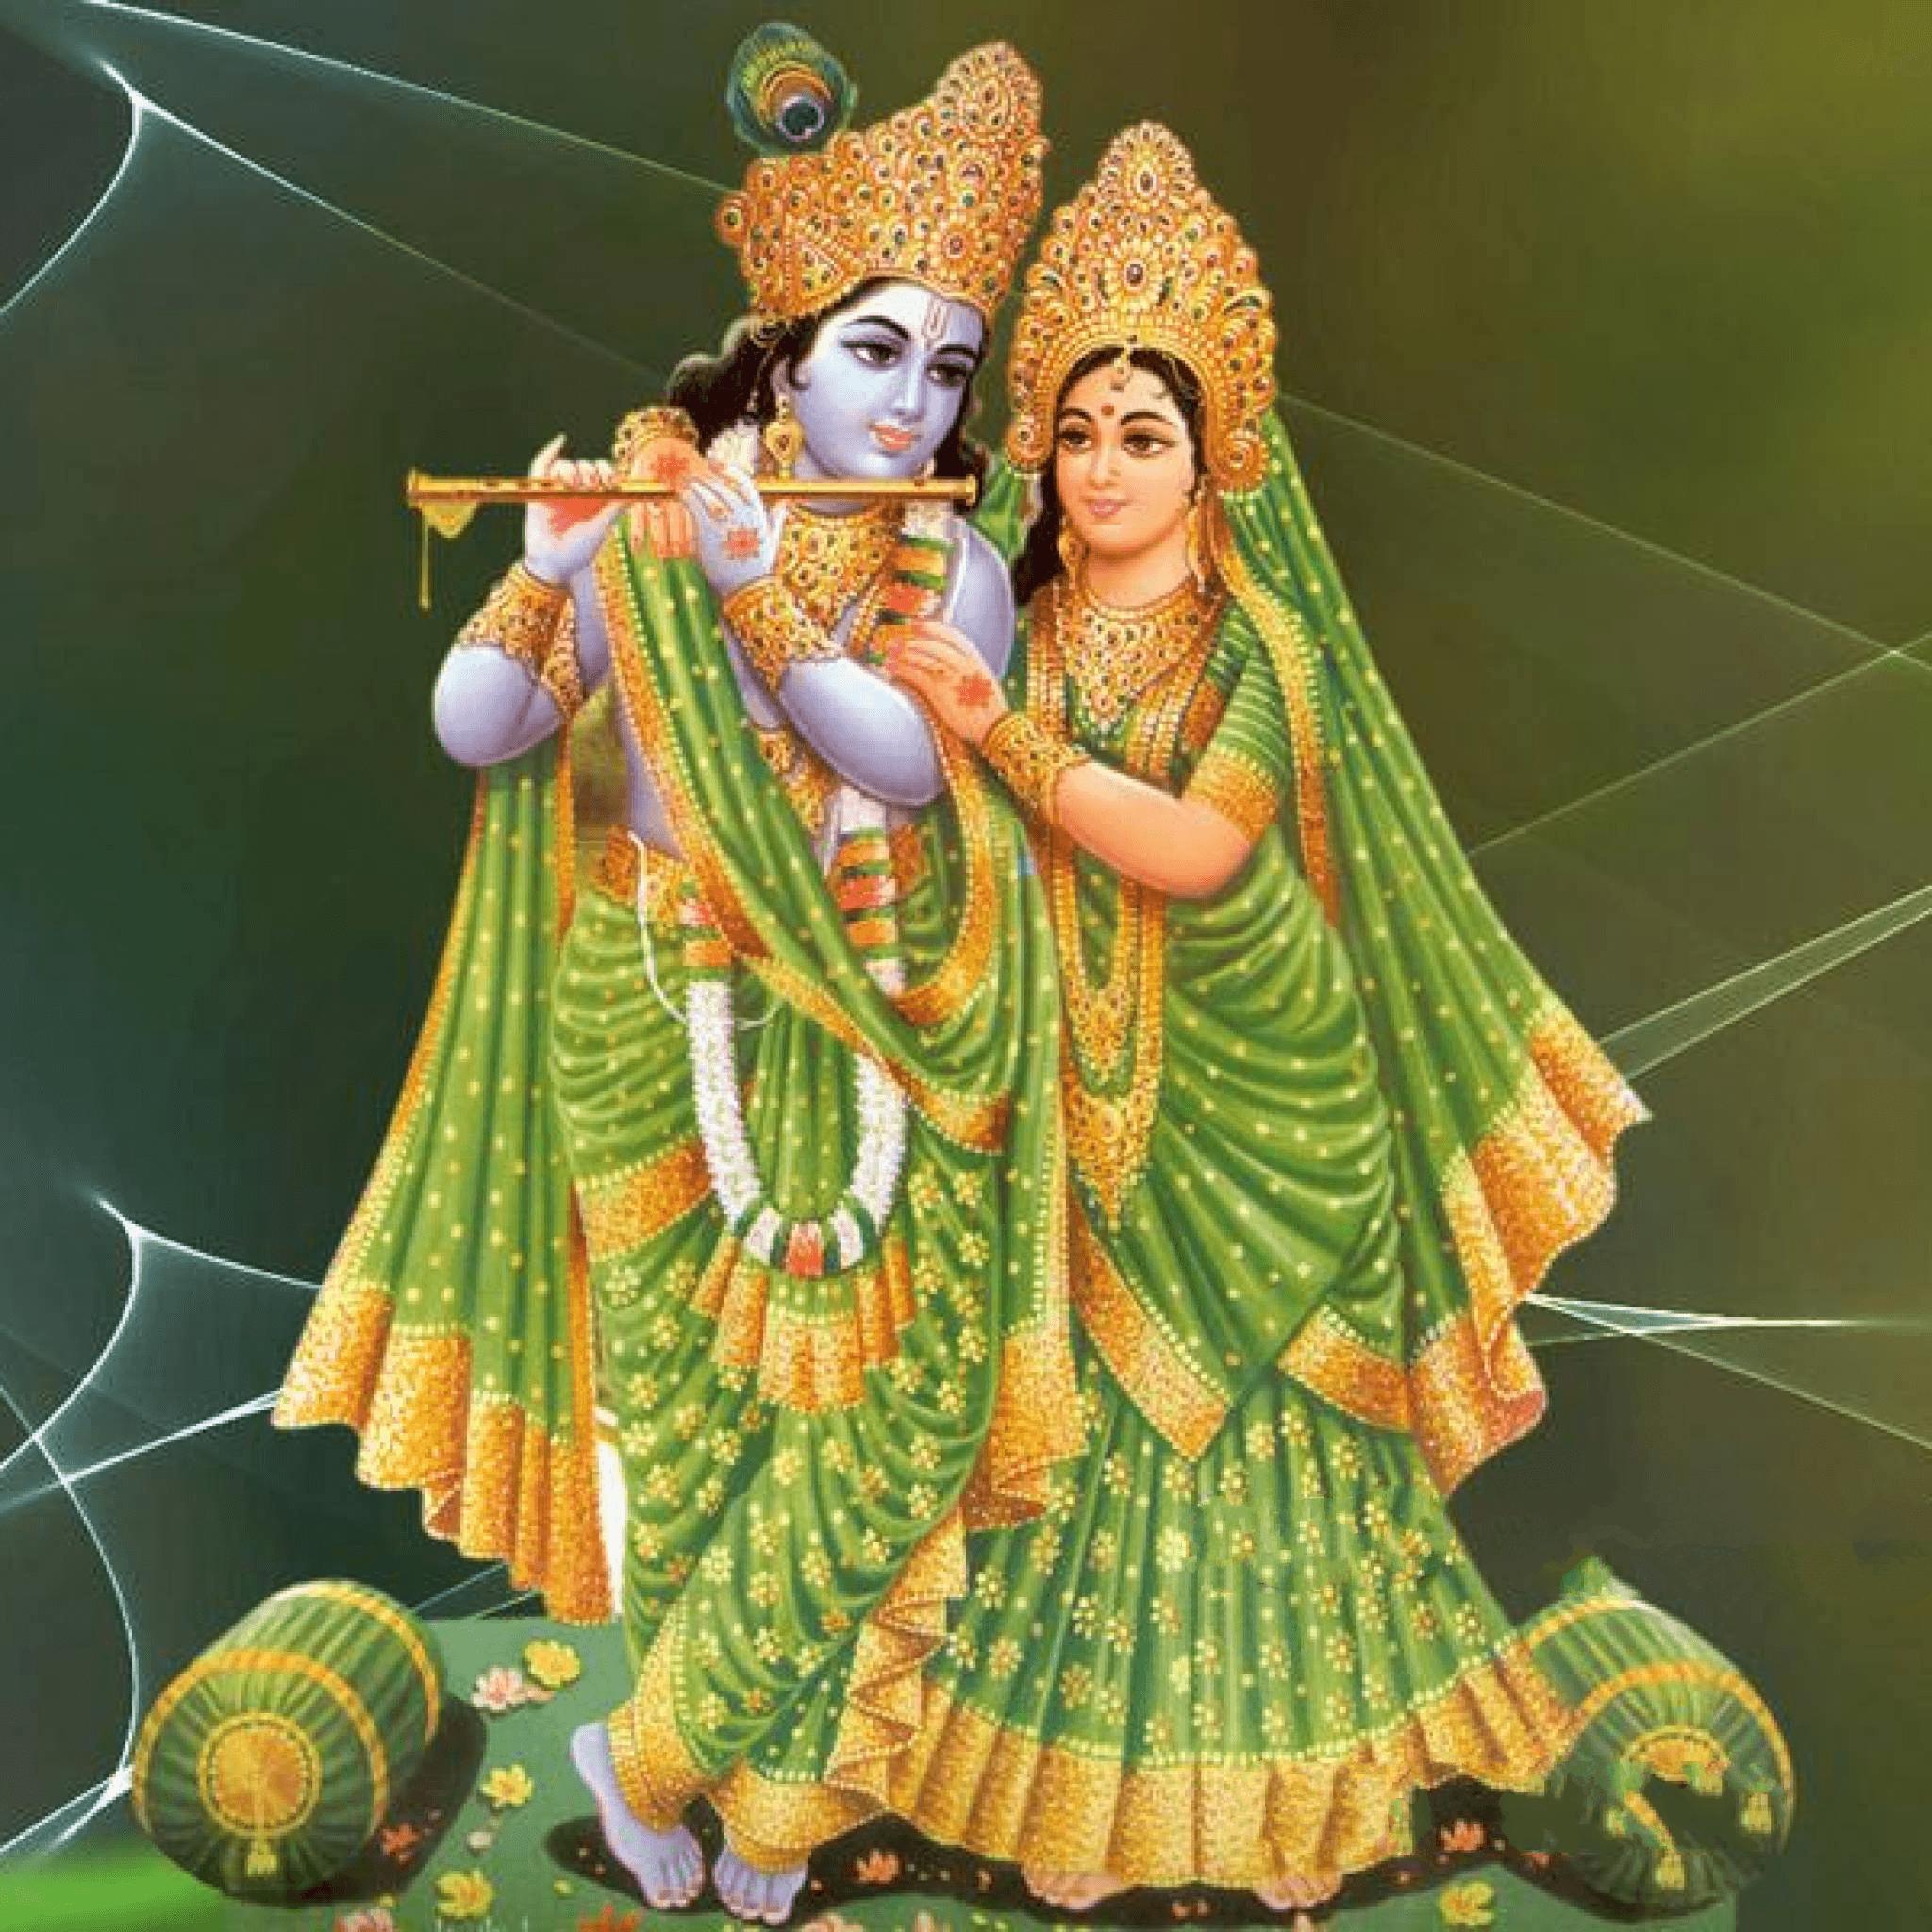 Radha Krishna Hd Wallpapers Top Free Radha Krishna Hd Backgrounds Wallpaperaccess